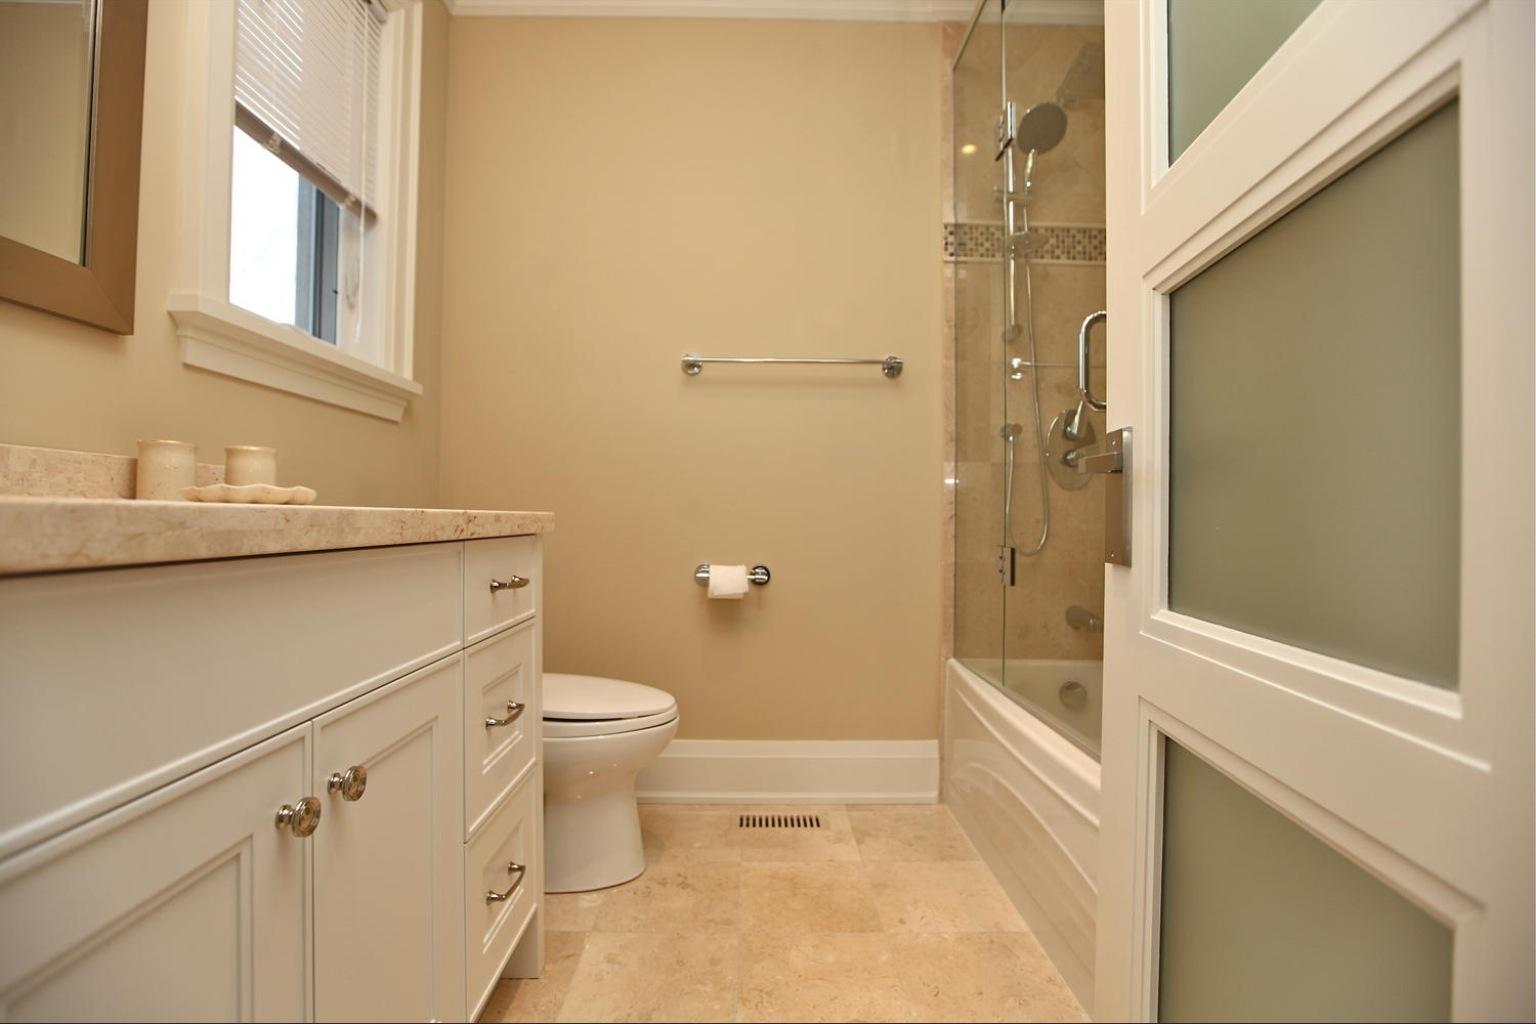 Bathroom Renovations And Remodeling Toronto - Bathroom remodel ontario ca